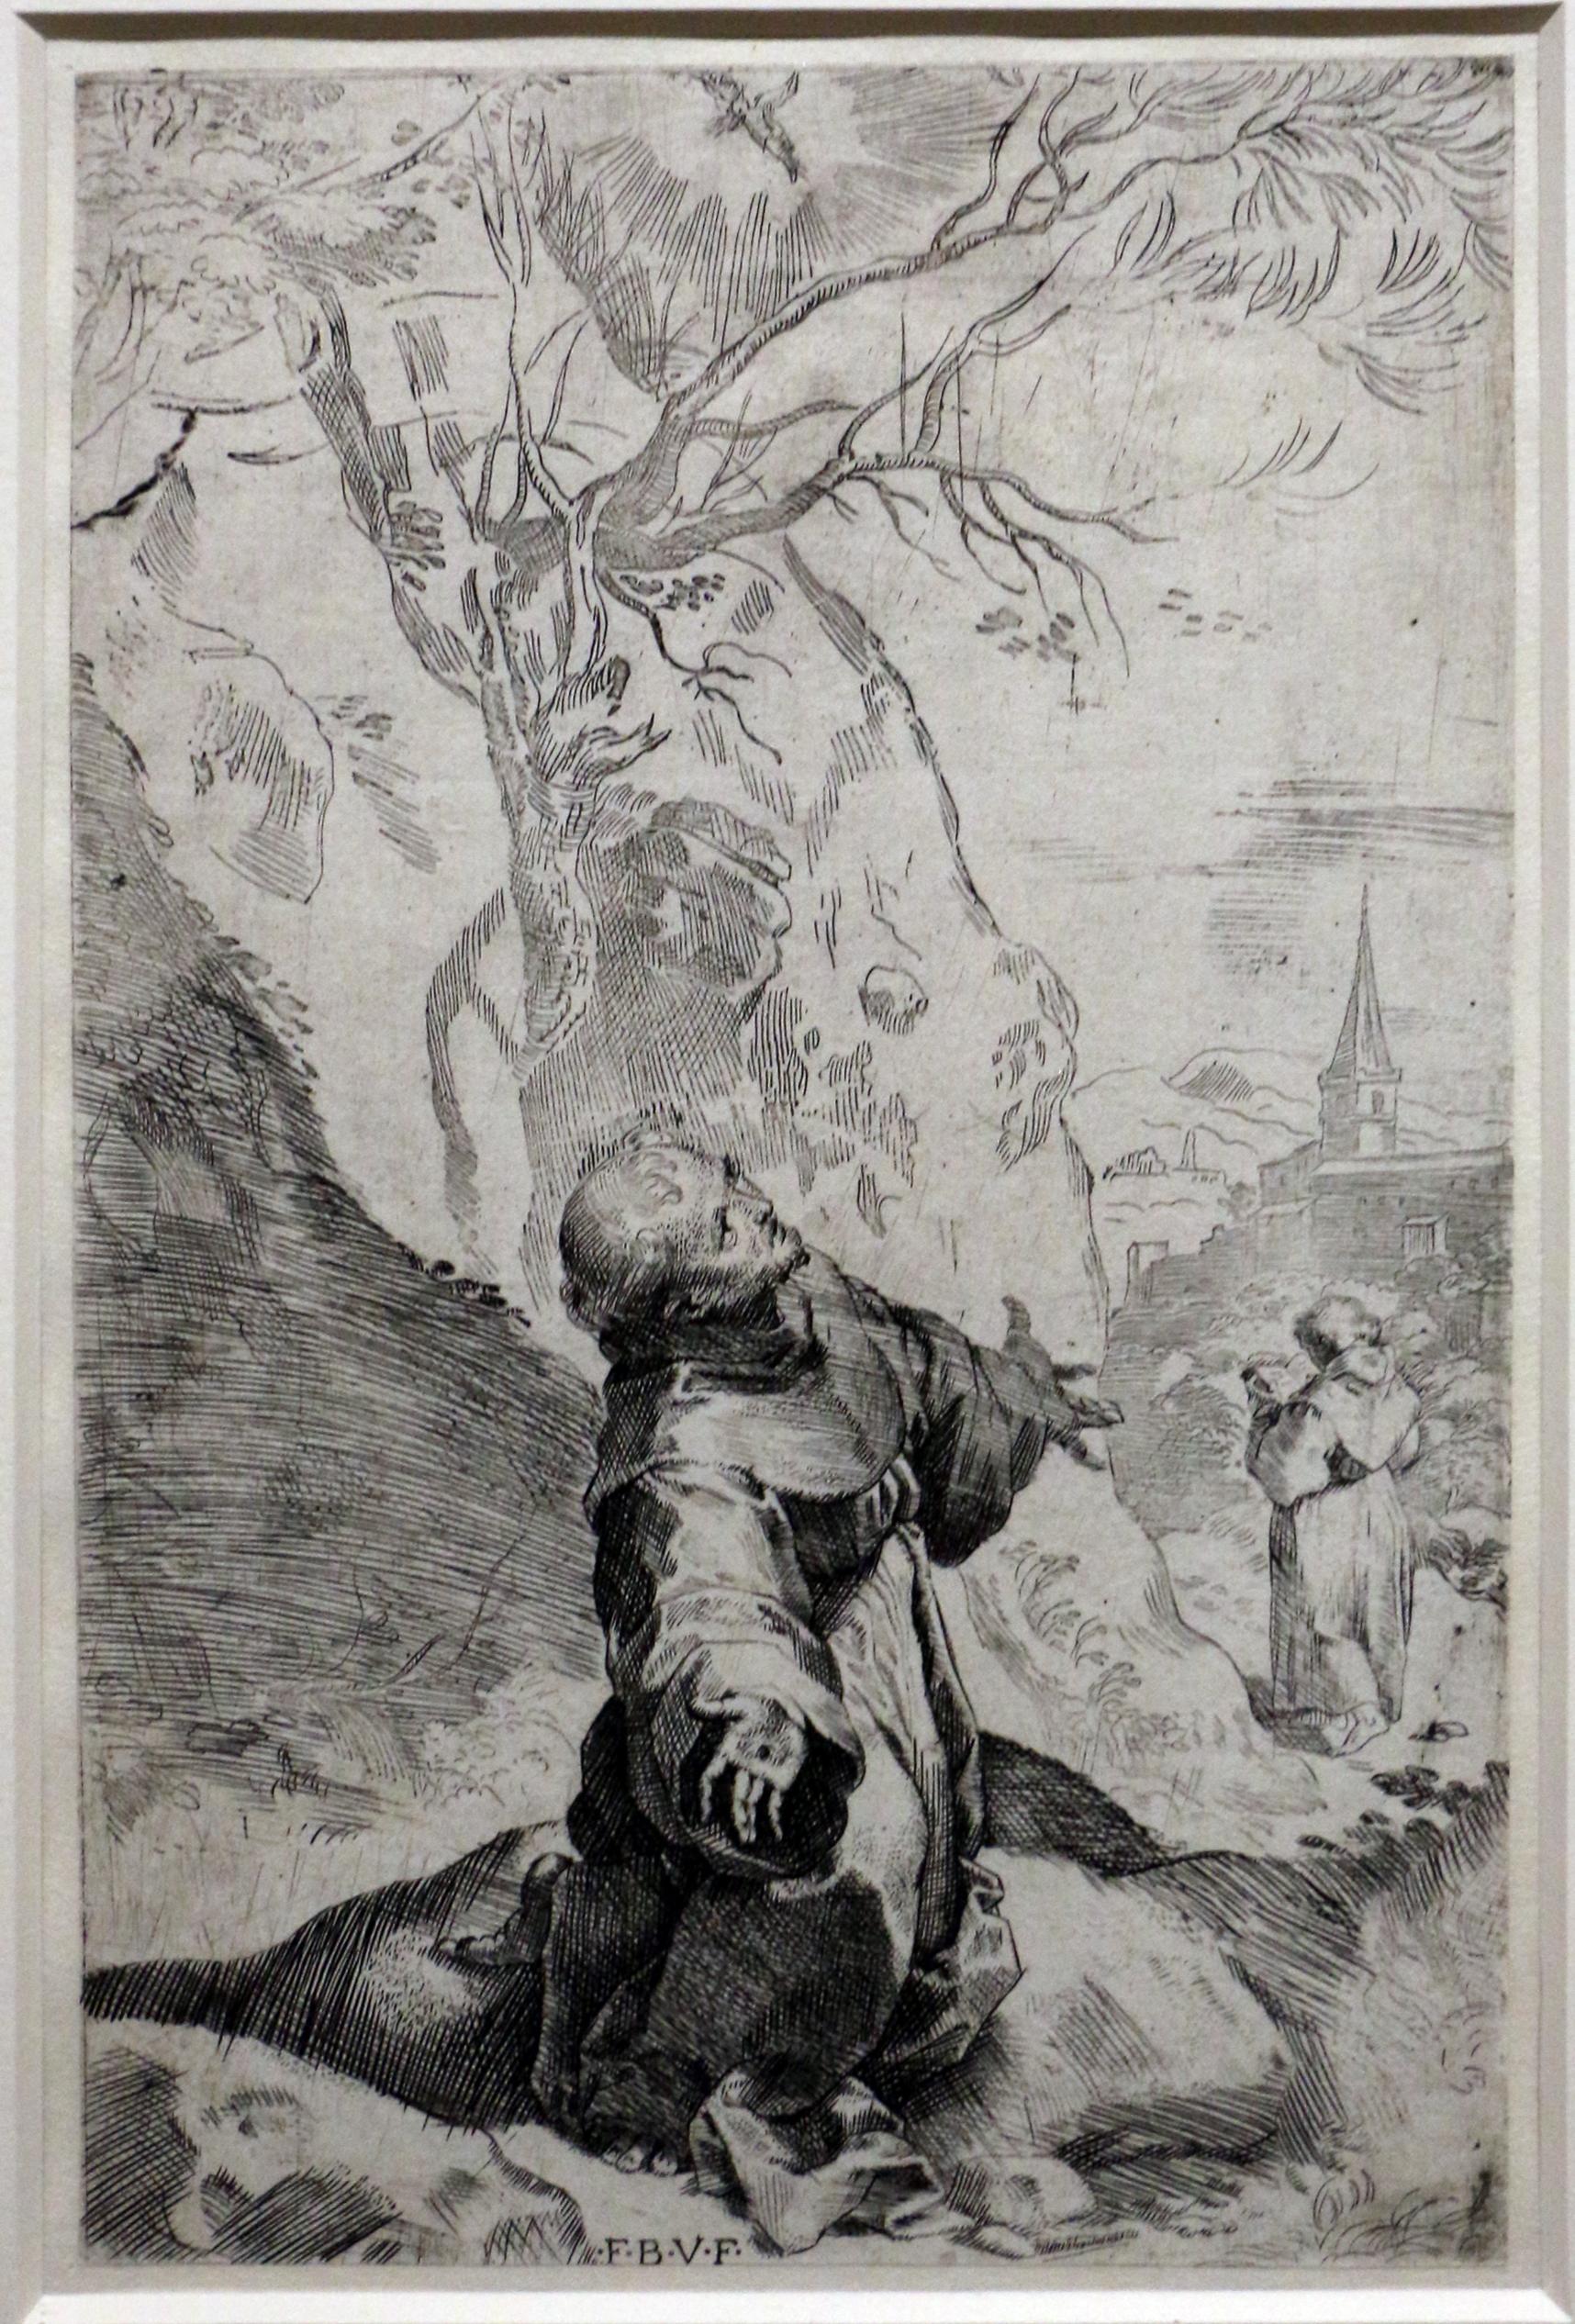 File:Federico barocci, san francesco riceve le stigmate, 1581-85 (amsterdam